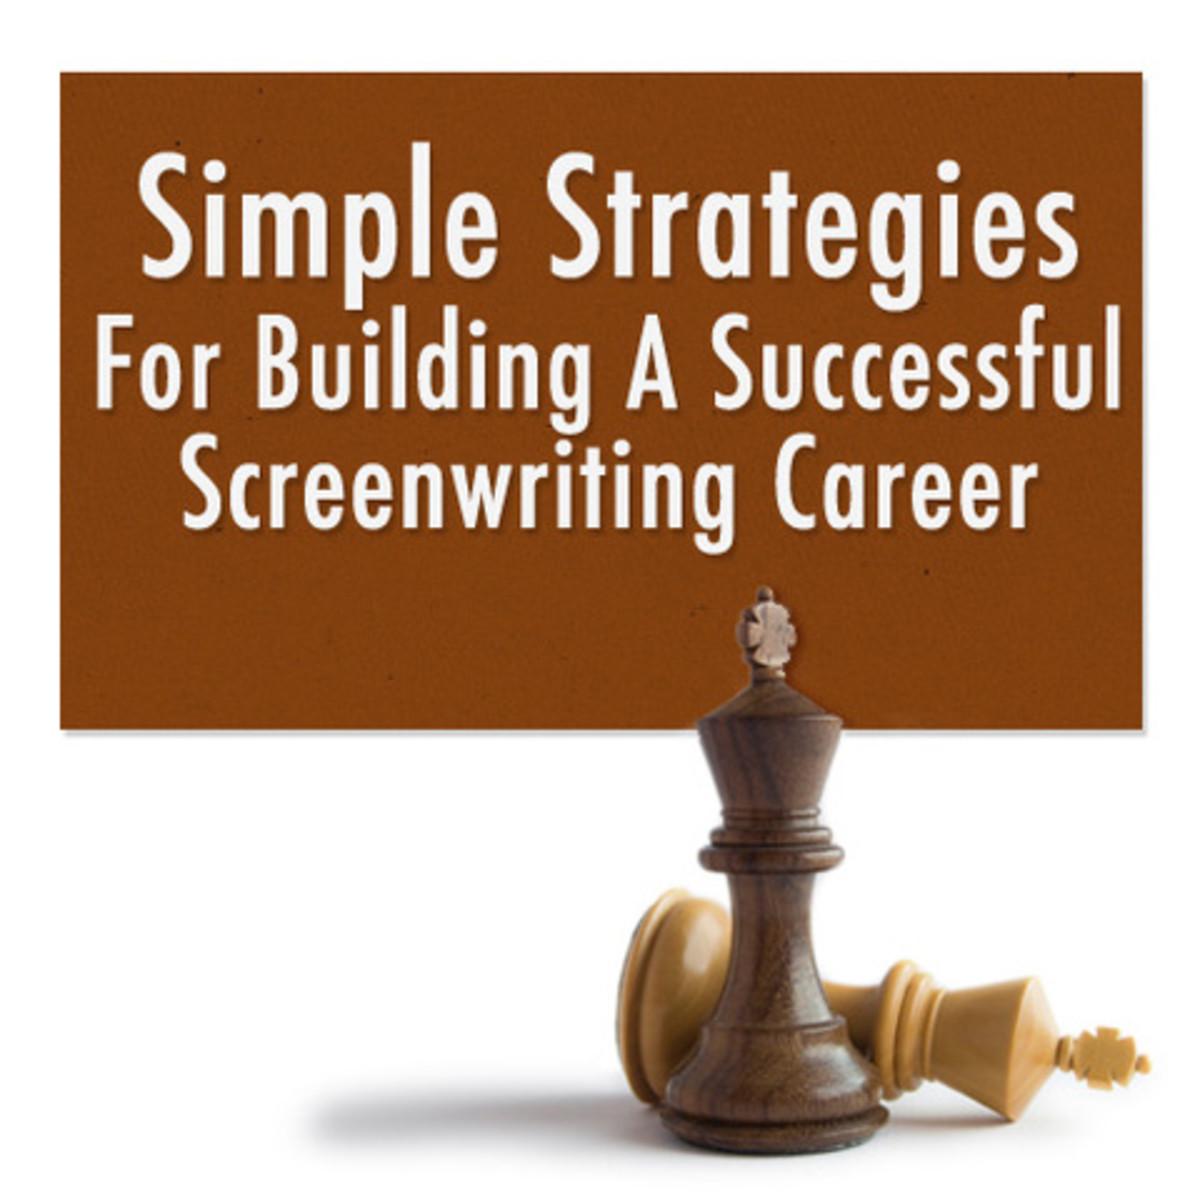 ws_simples tratigies_screenwriting_career_medium